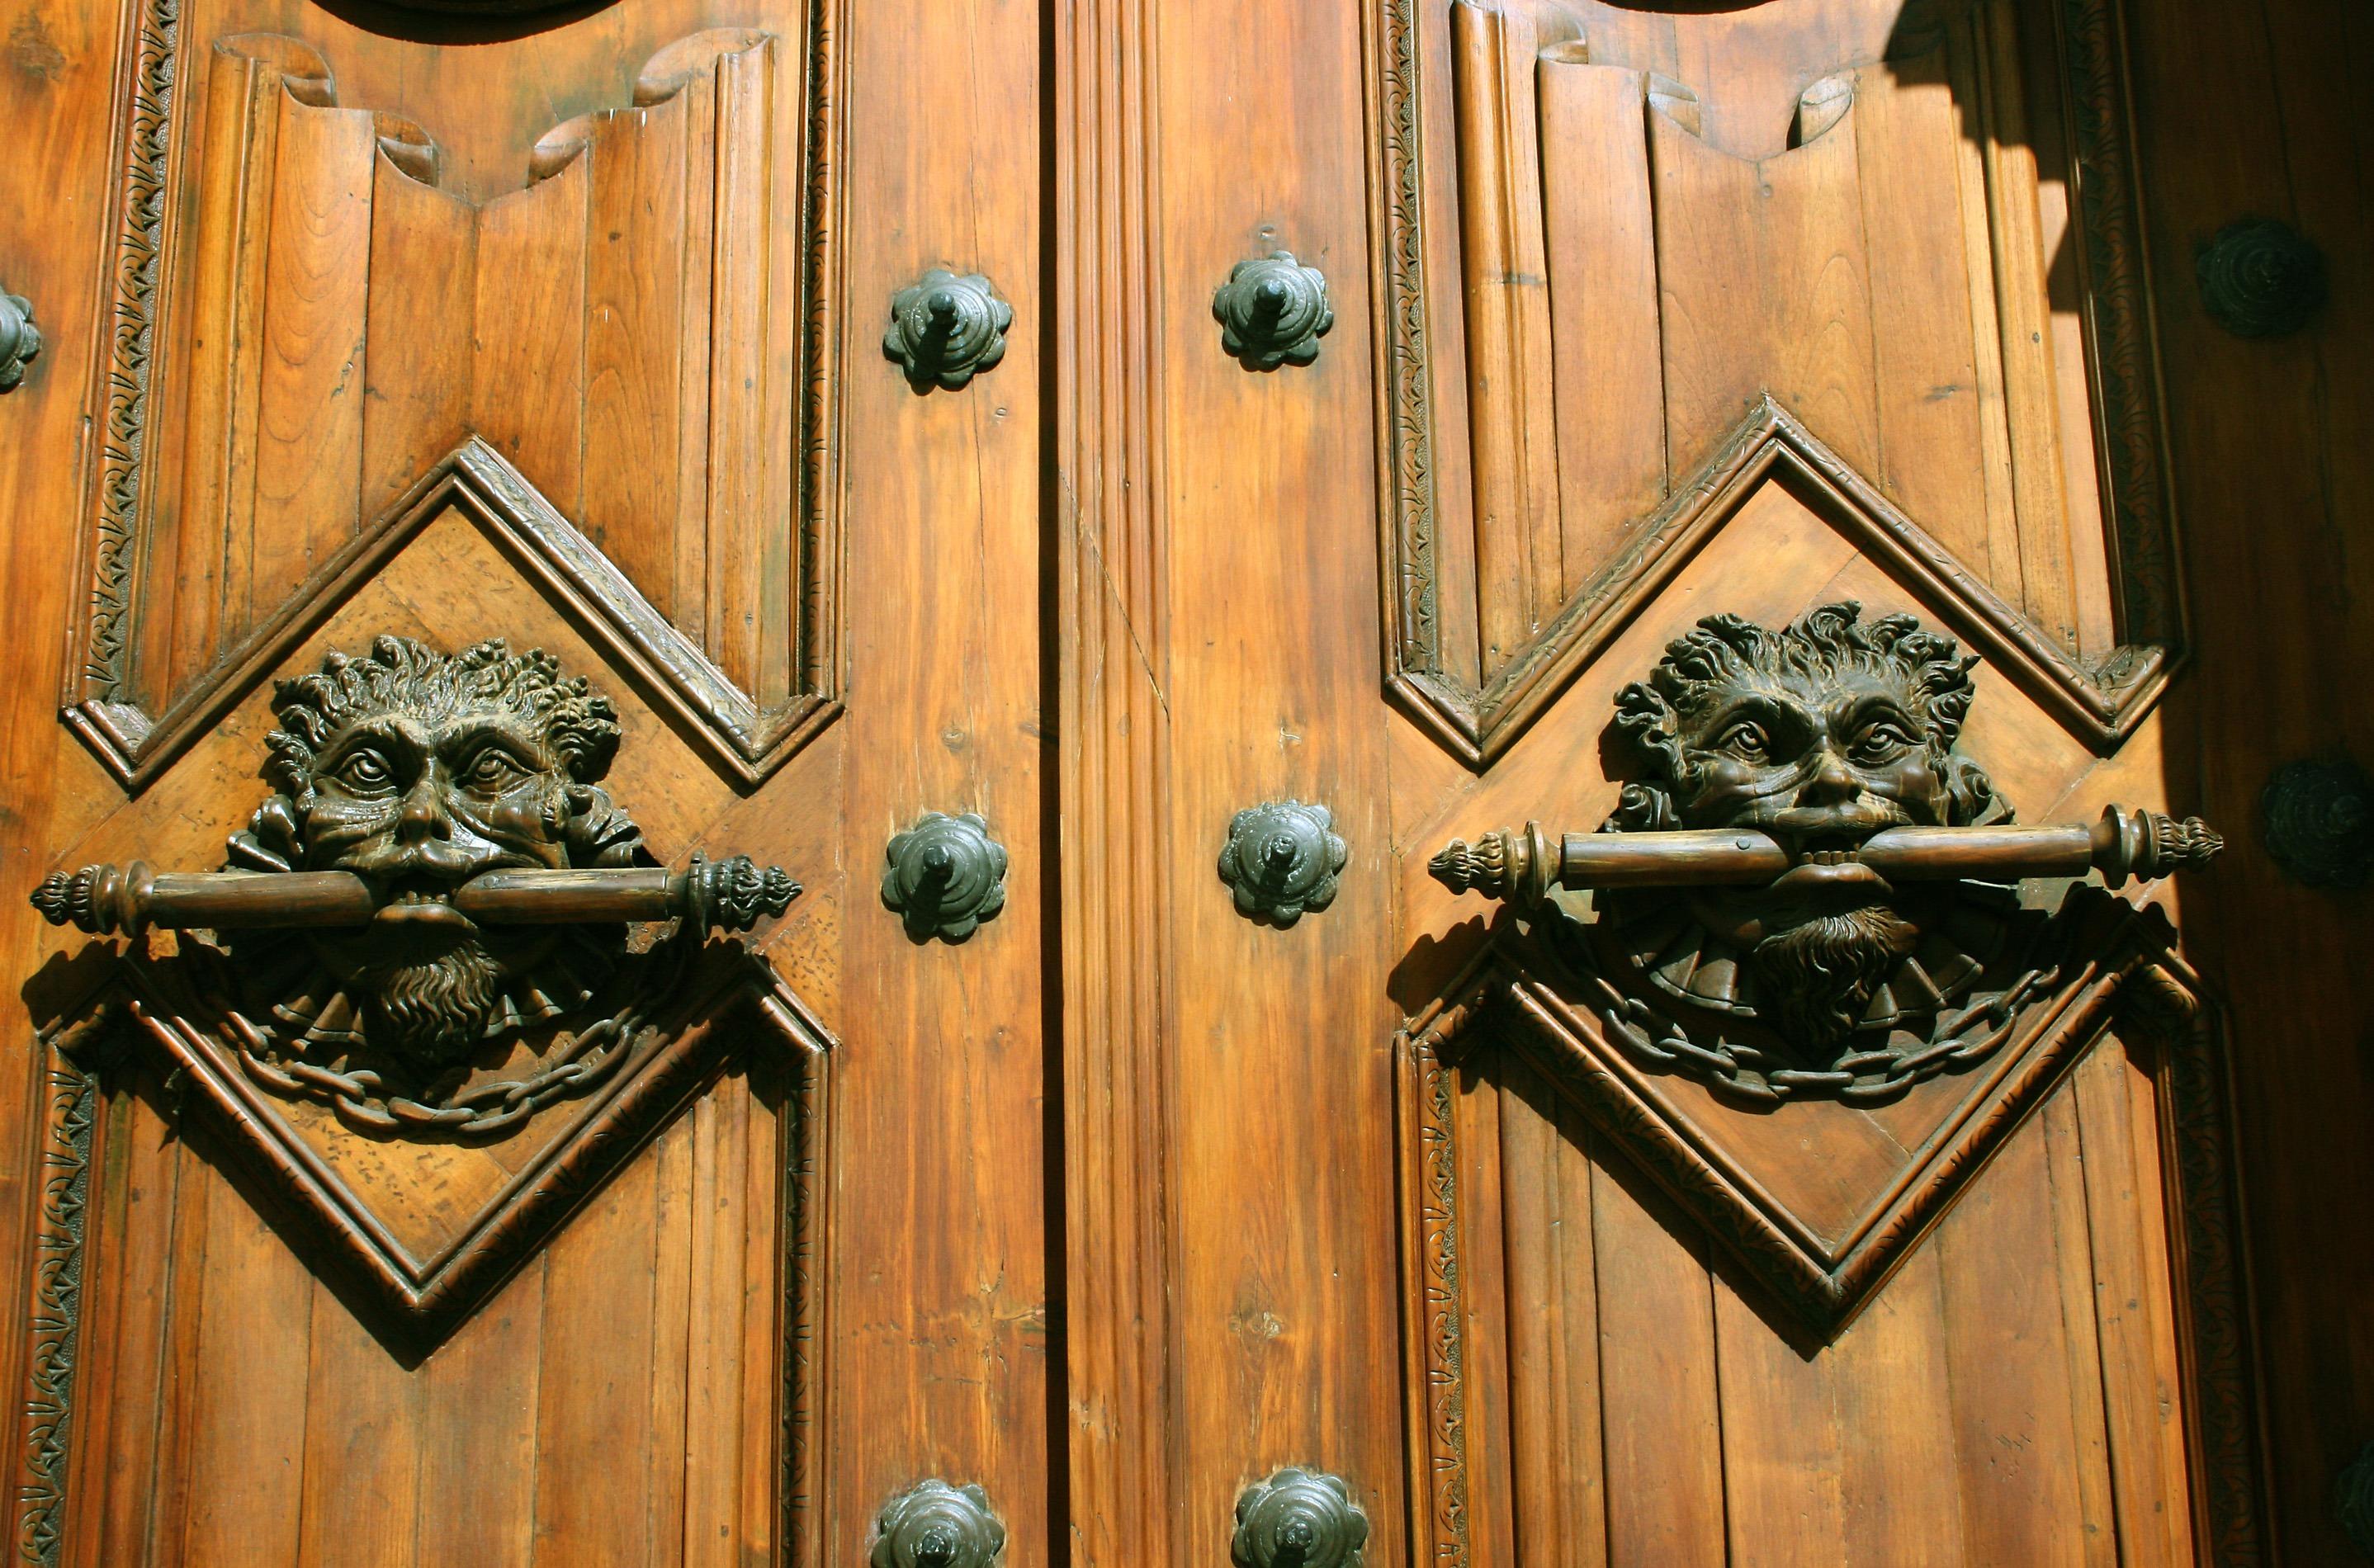 Fotos Gratis Madera Ventana Mueble Puerta Simetr A Tallado  # Muebles Historicos